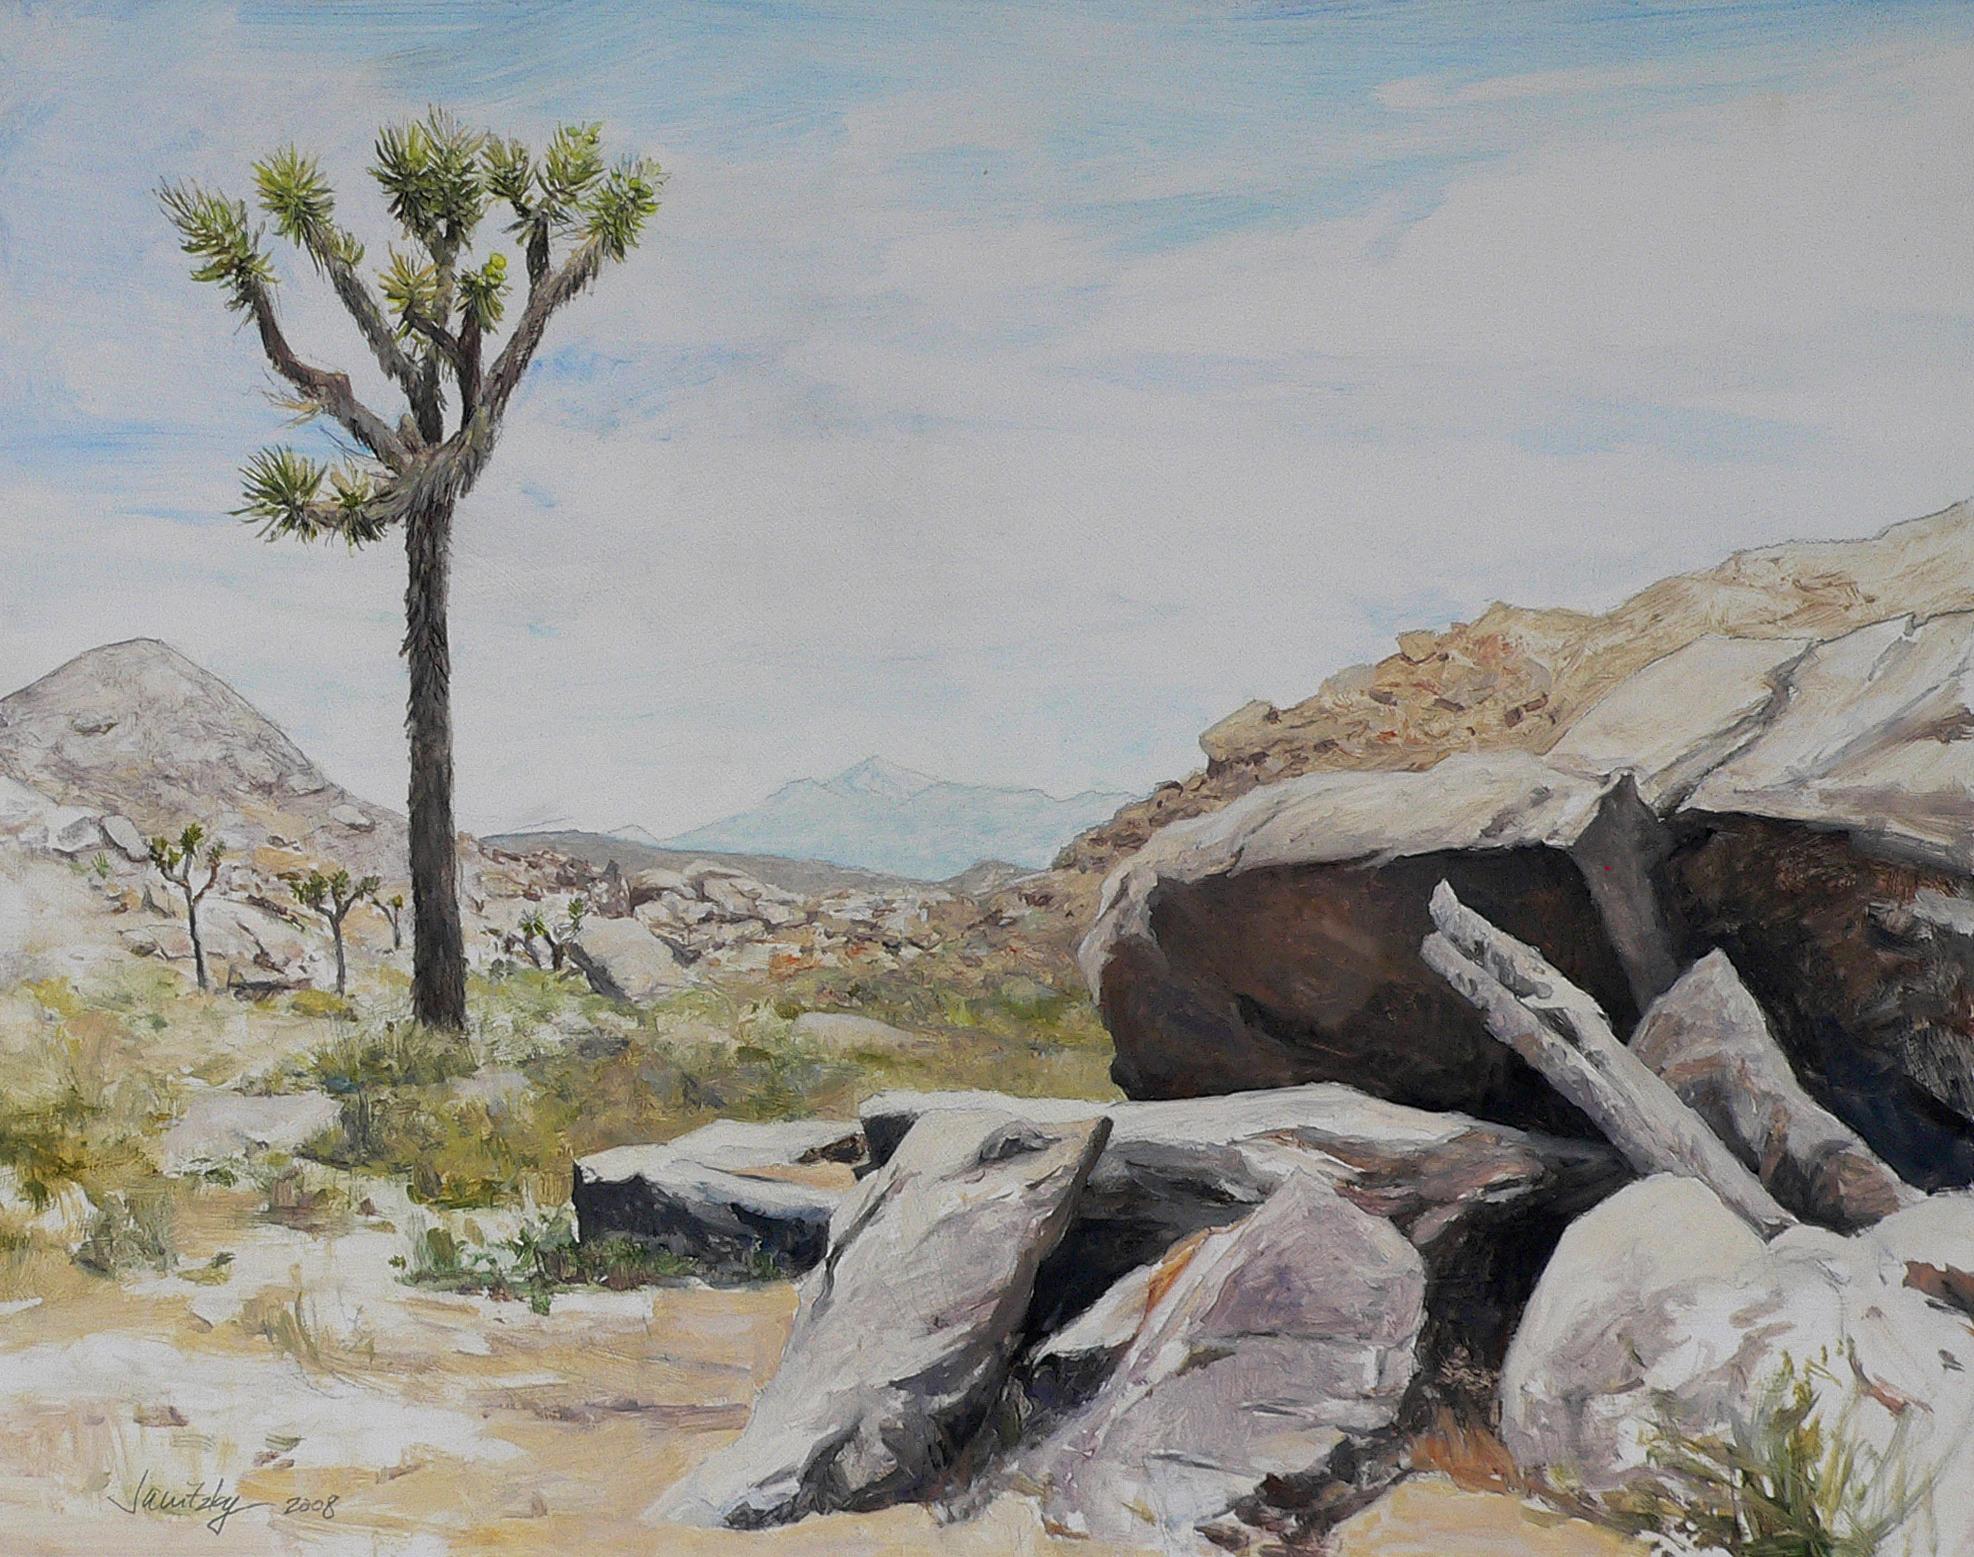 Rocks and Joshua Tree.